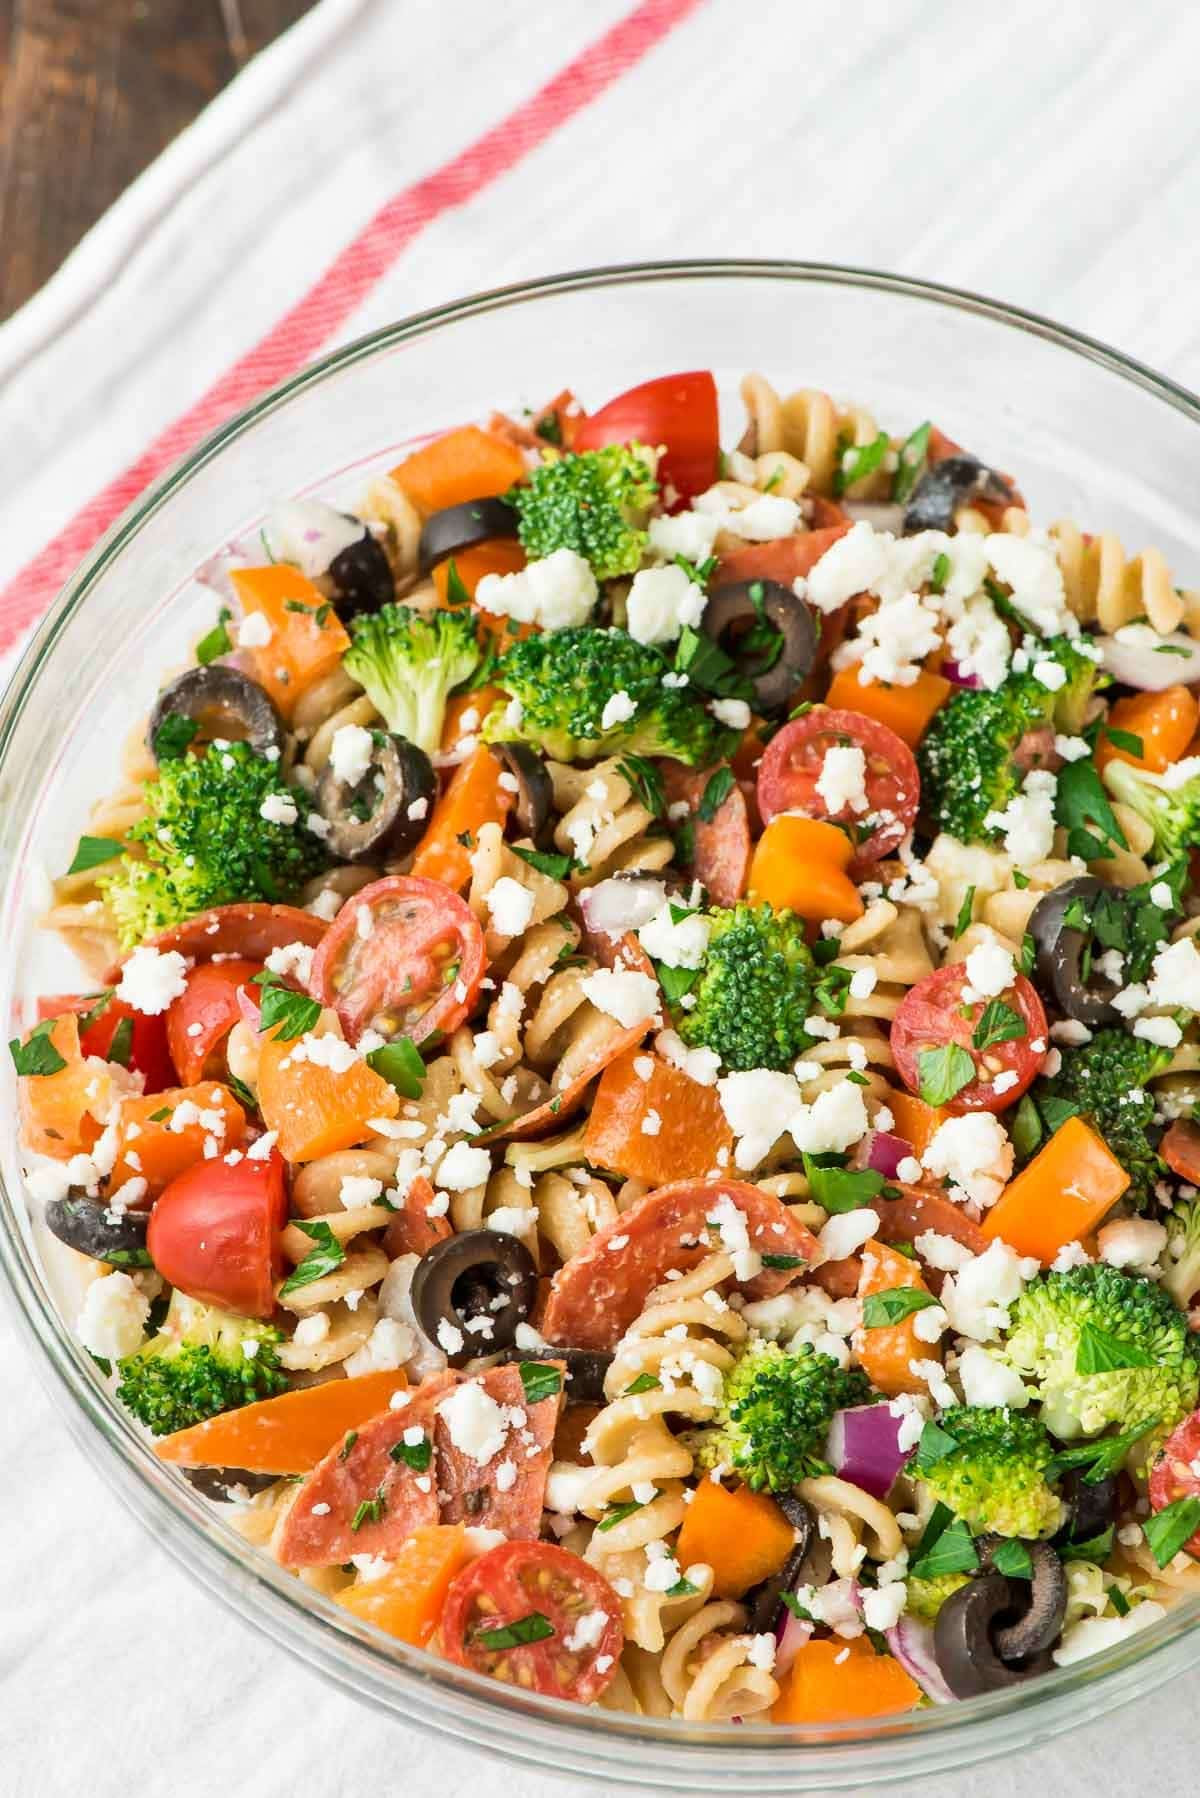 Healthy Pasta Salad Dressing  healthy pasta salad dressing